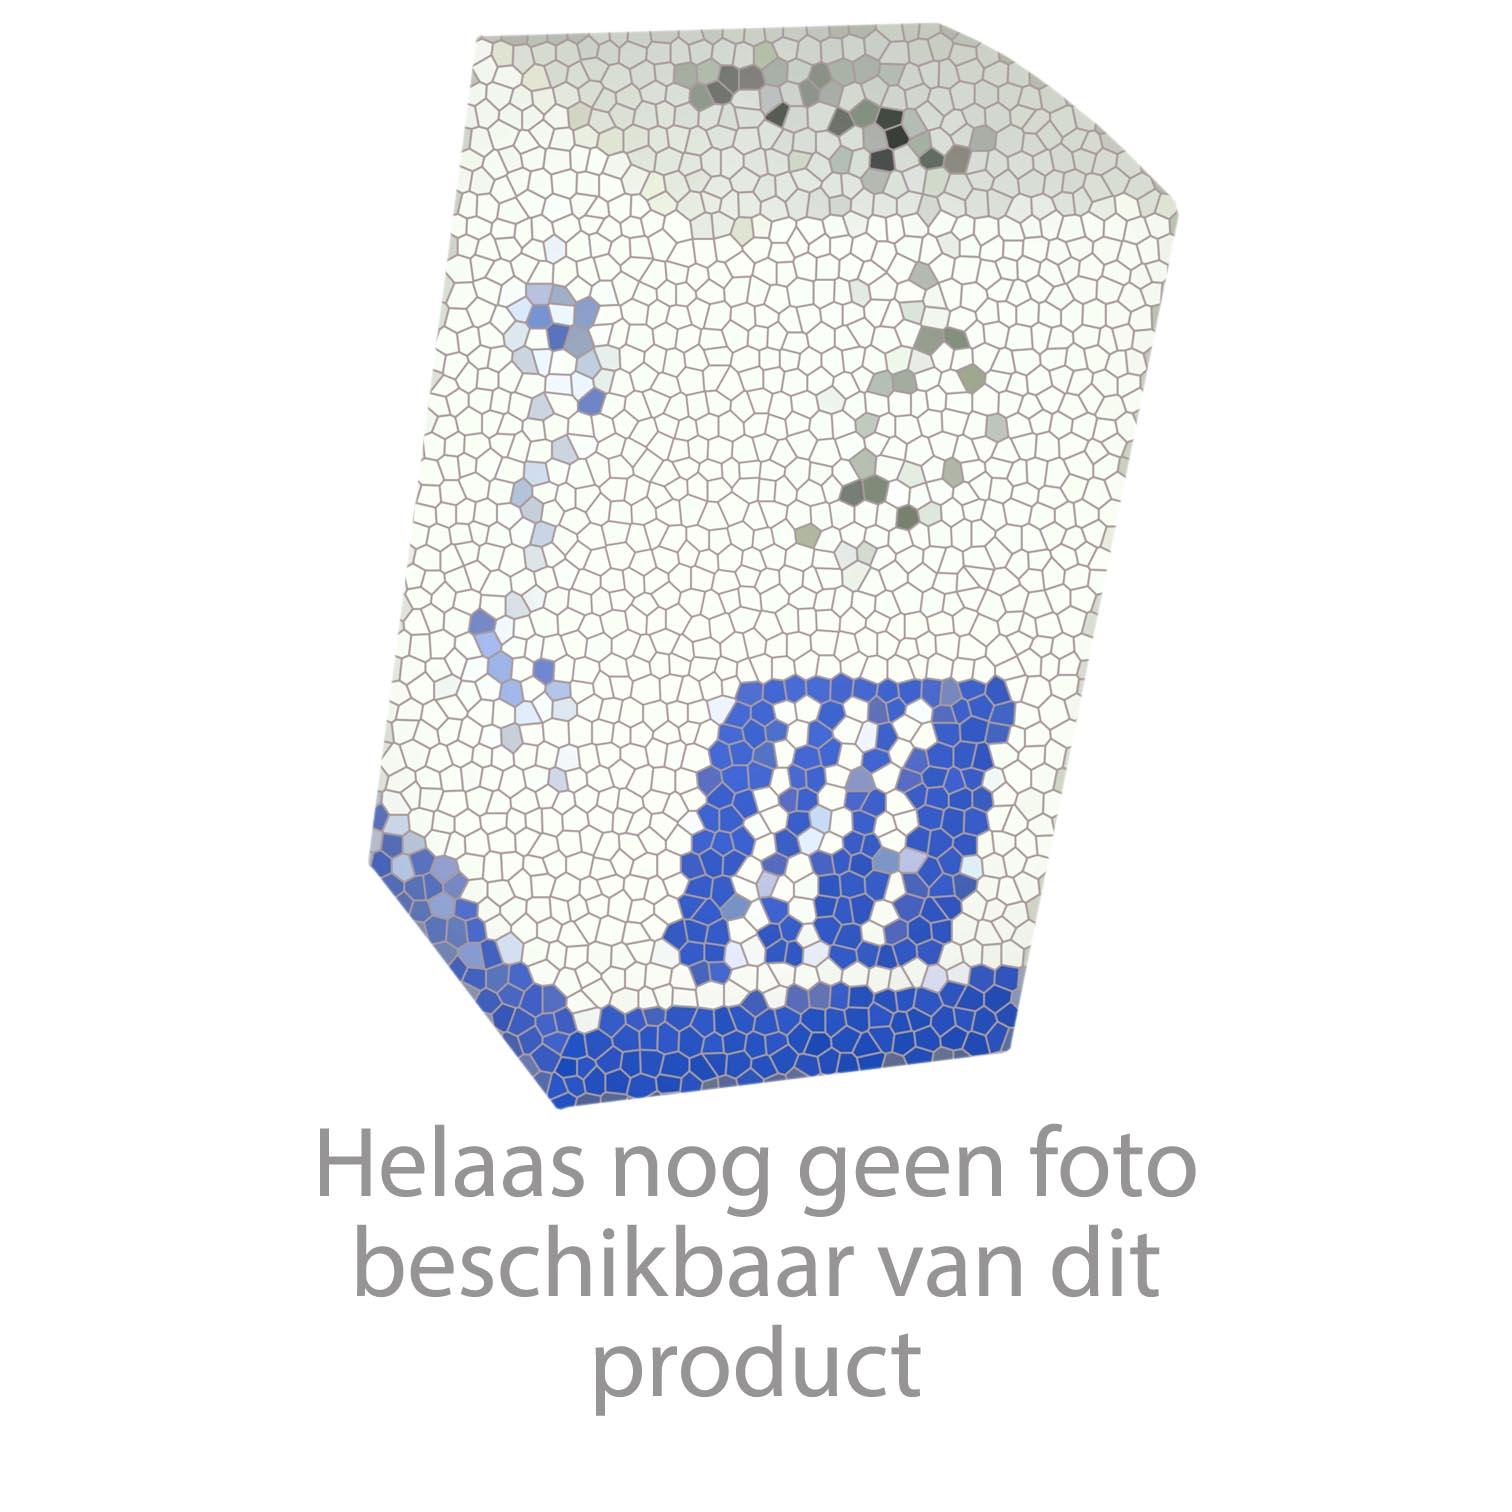 Perrin & Rowe Ionian Tweehendel keukenmengkraan wandmontage met porseleinen hendels en keramische binnenwerken hoh 200 mm Chroom